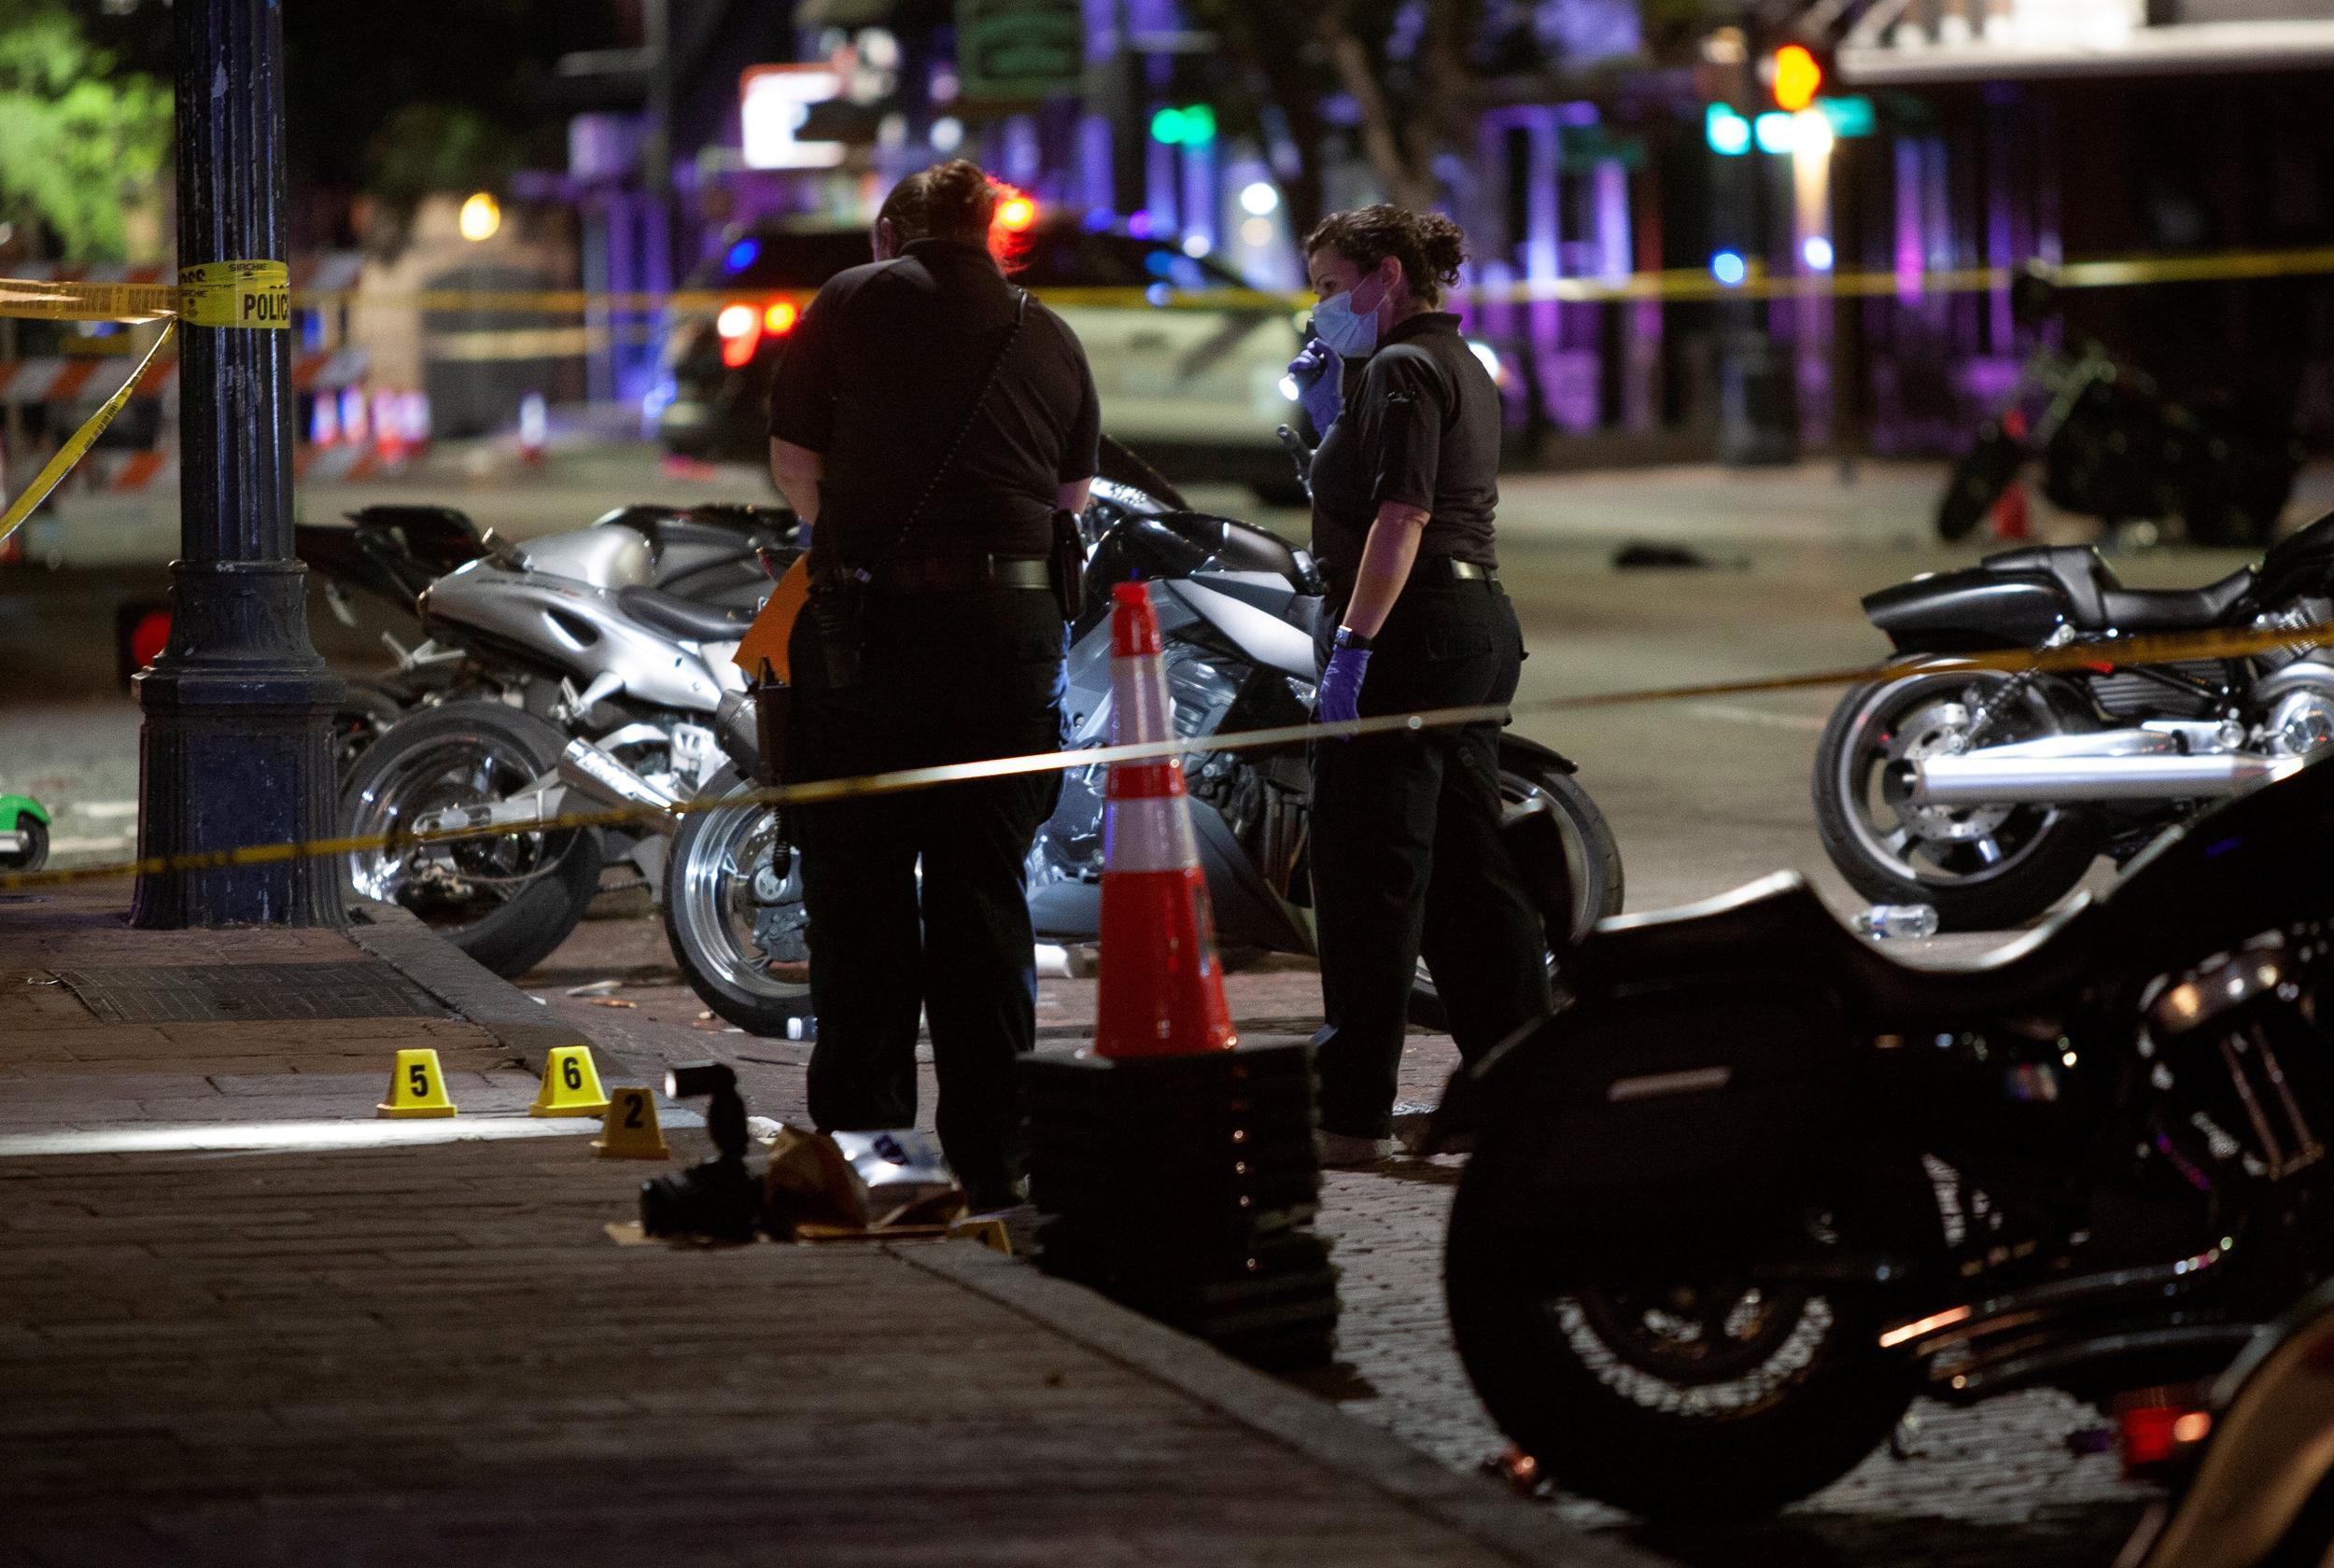 1 of 2 suspects in custody in Austin attack